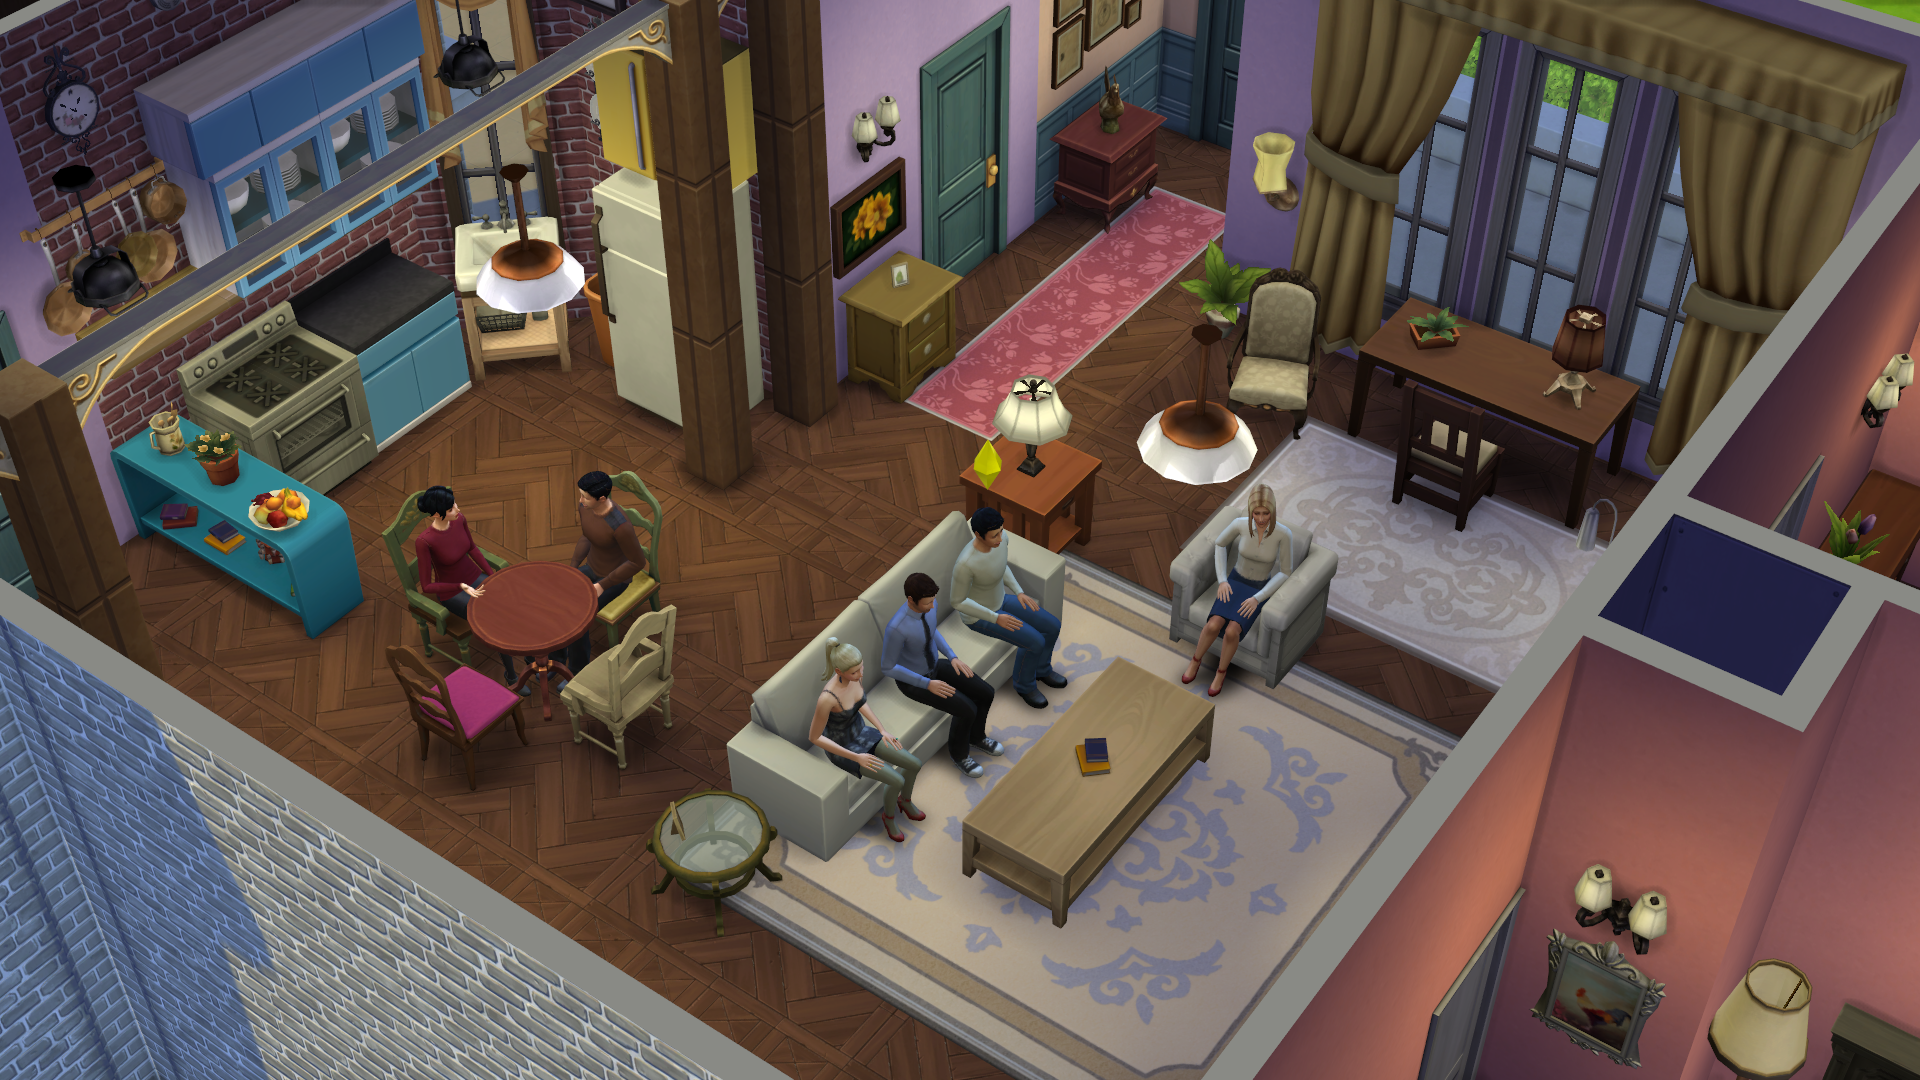 Sims 3 vore mod nude sexgirl